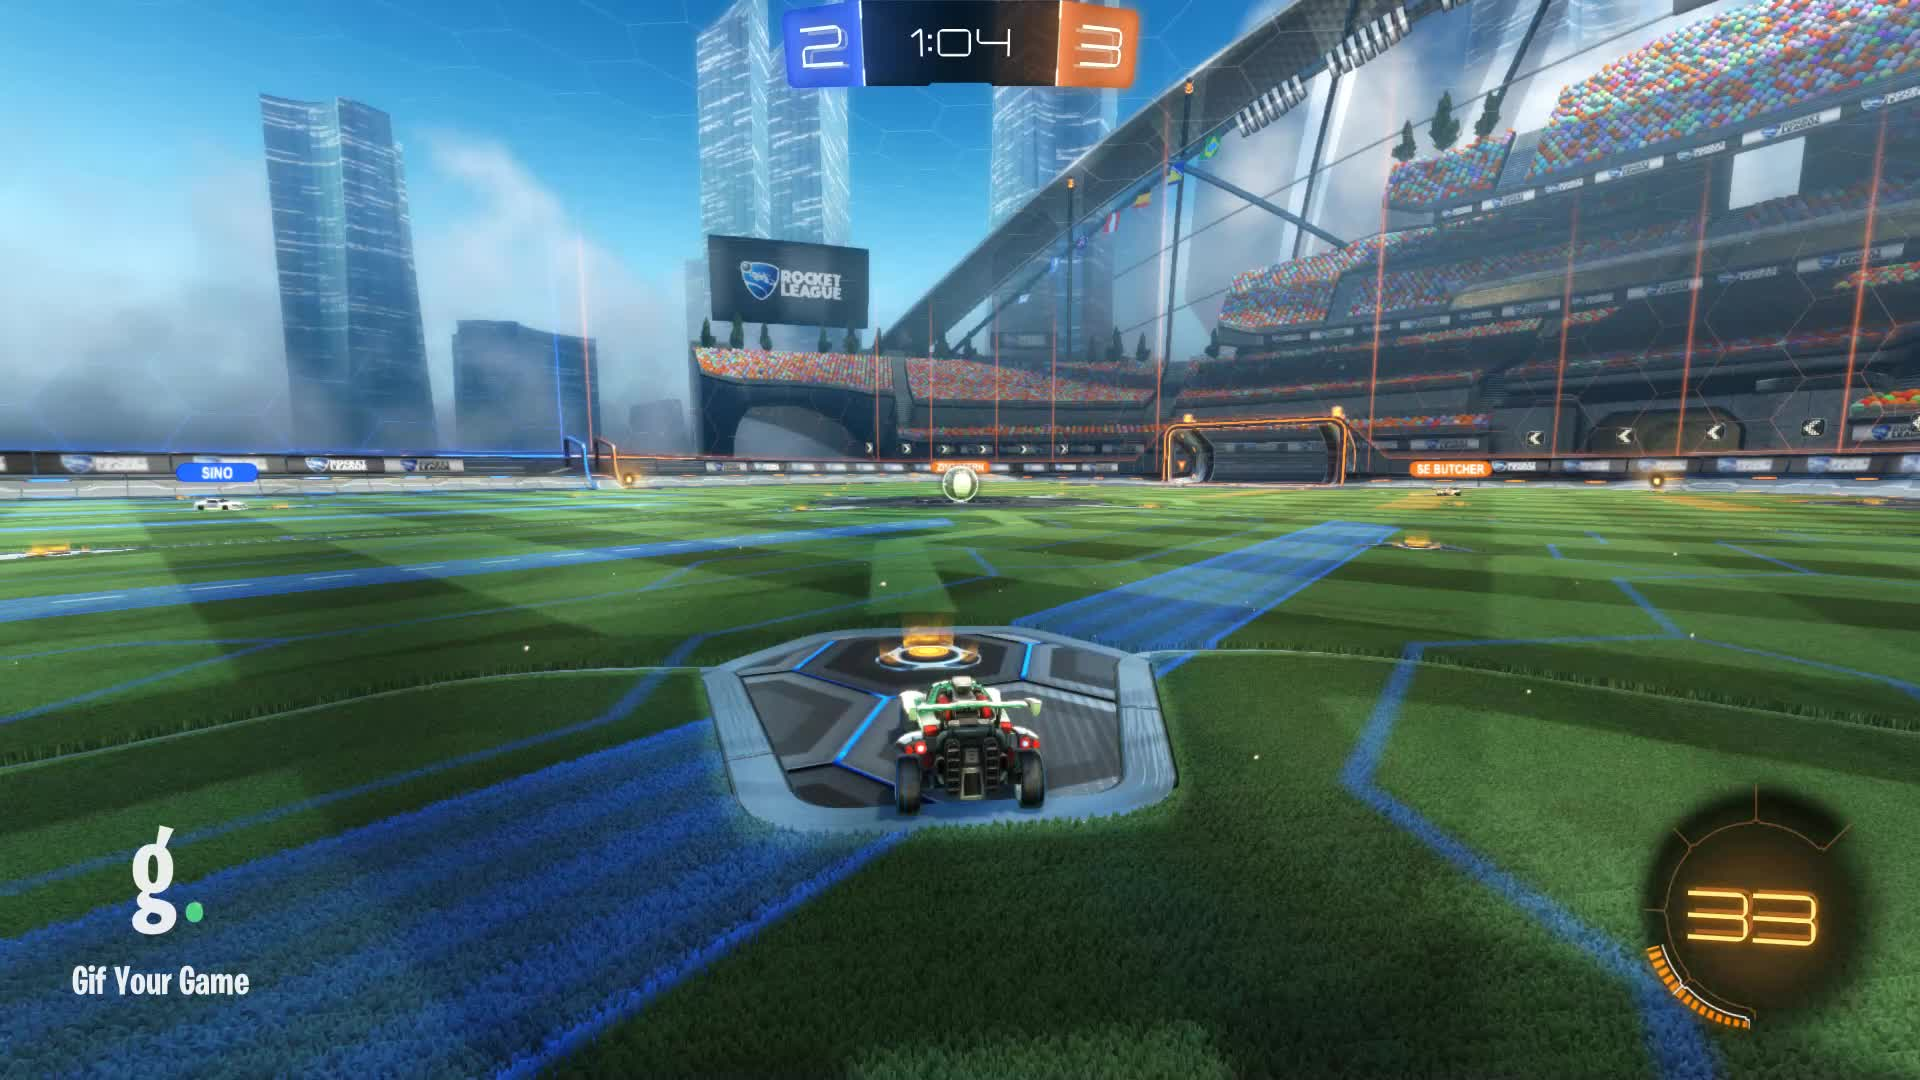 Gif Your Game, GifYourGame, Goal, Rocket League, RocketLeague, snus, Goal 6: snus GIFs